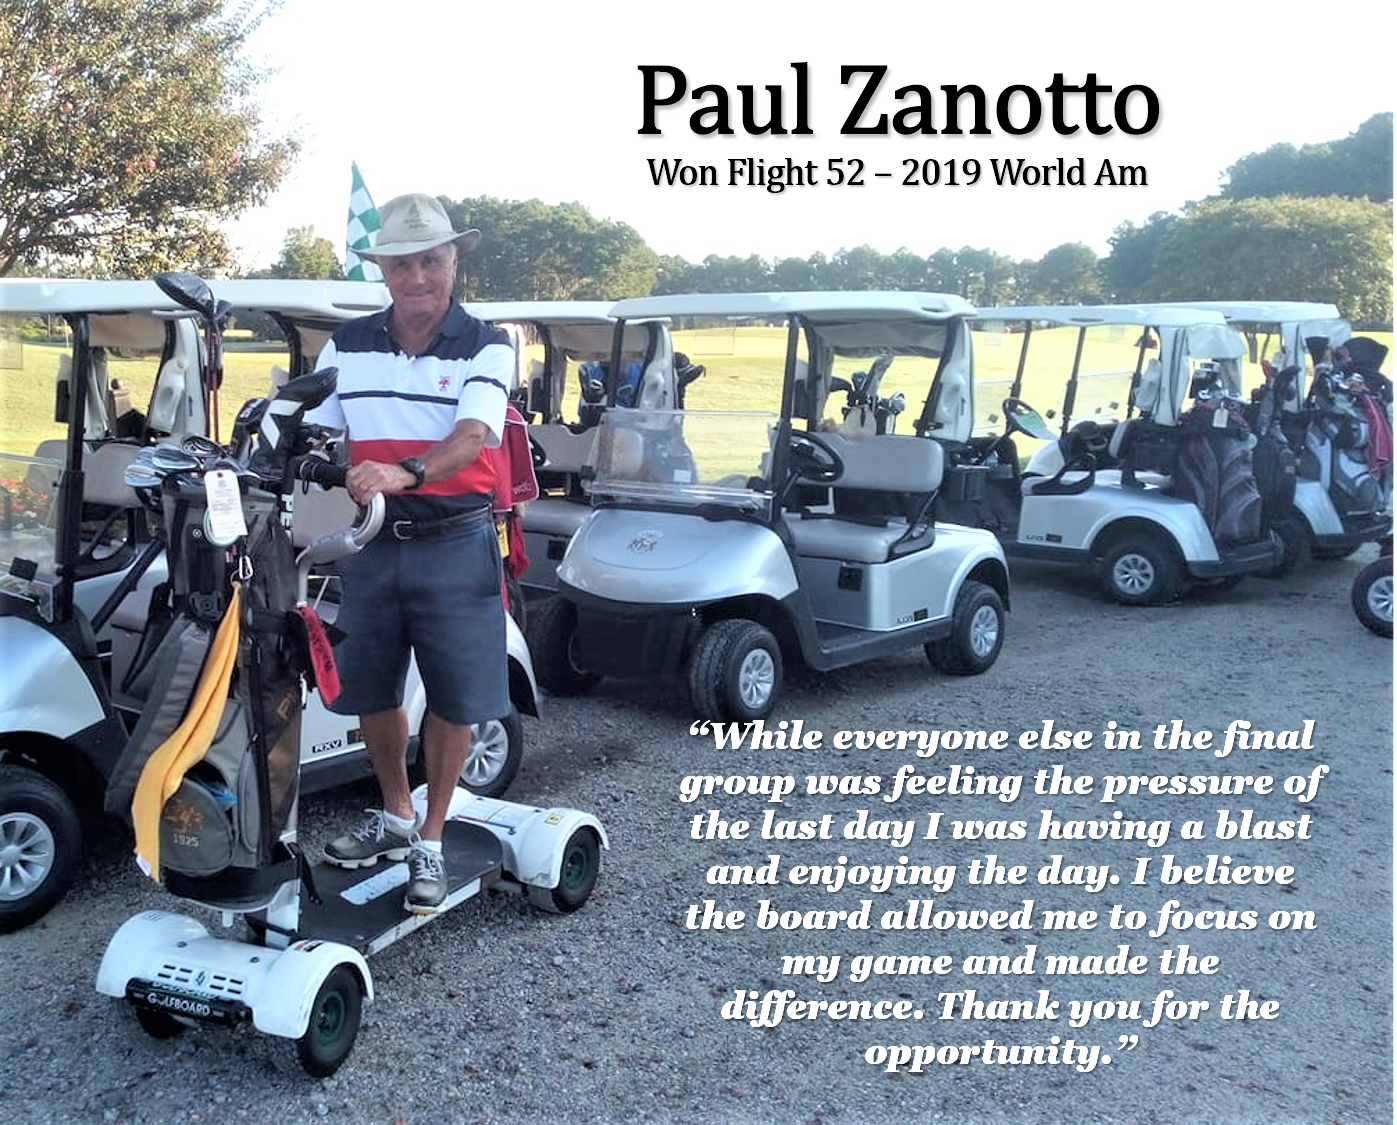 Paul Zanotto Place Card - Modified Brightened